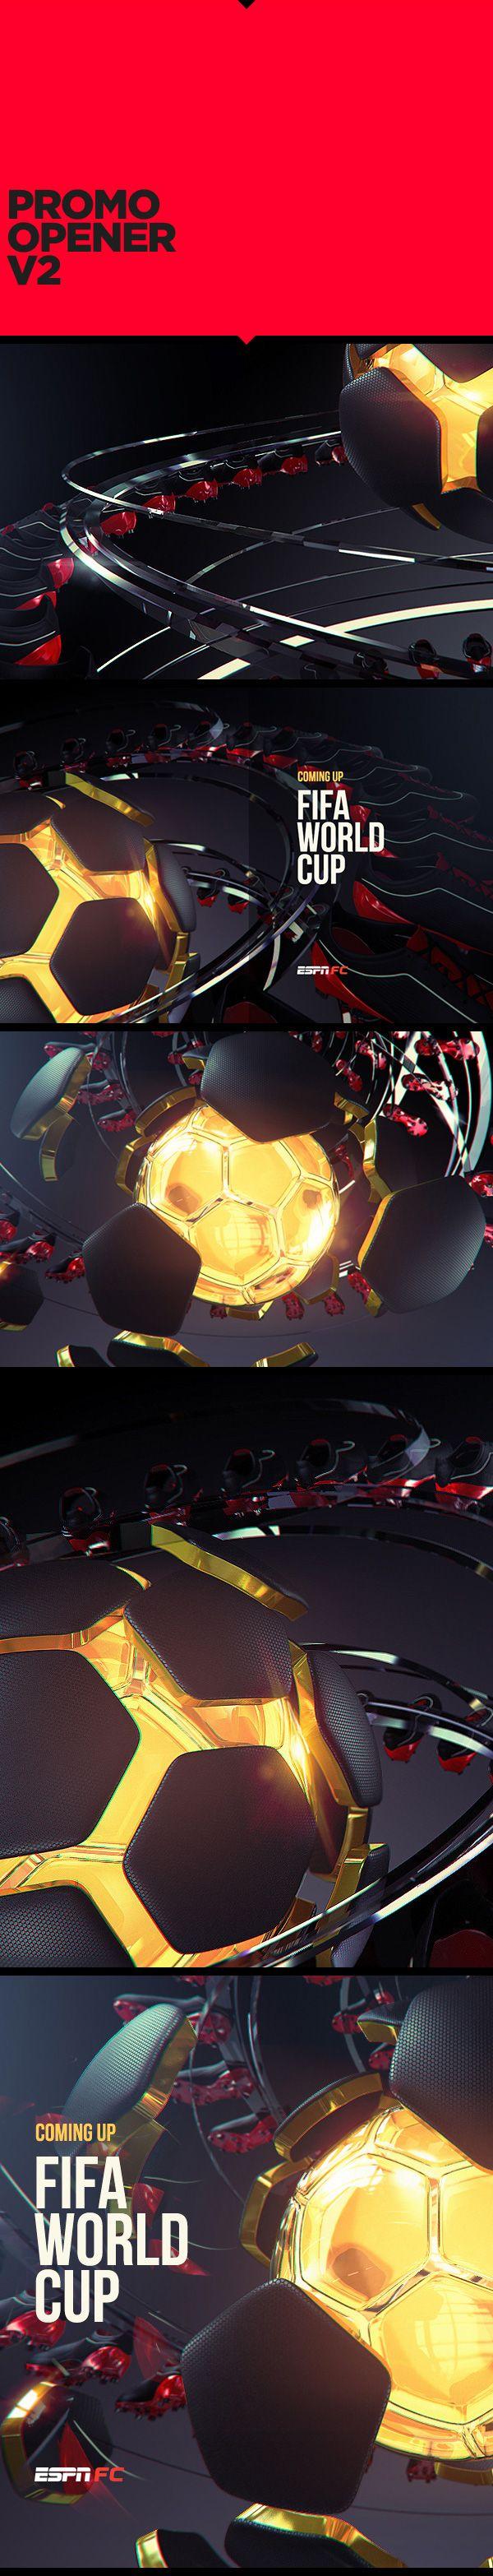 ESPN WORLD CUP SHOWPACK by Charlx Digital Art Director, via Behance